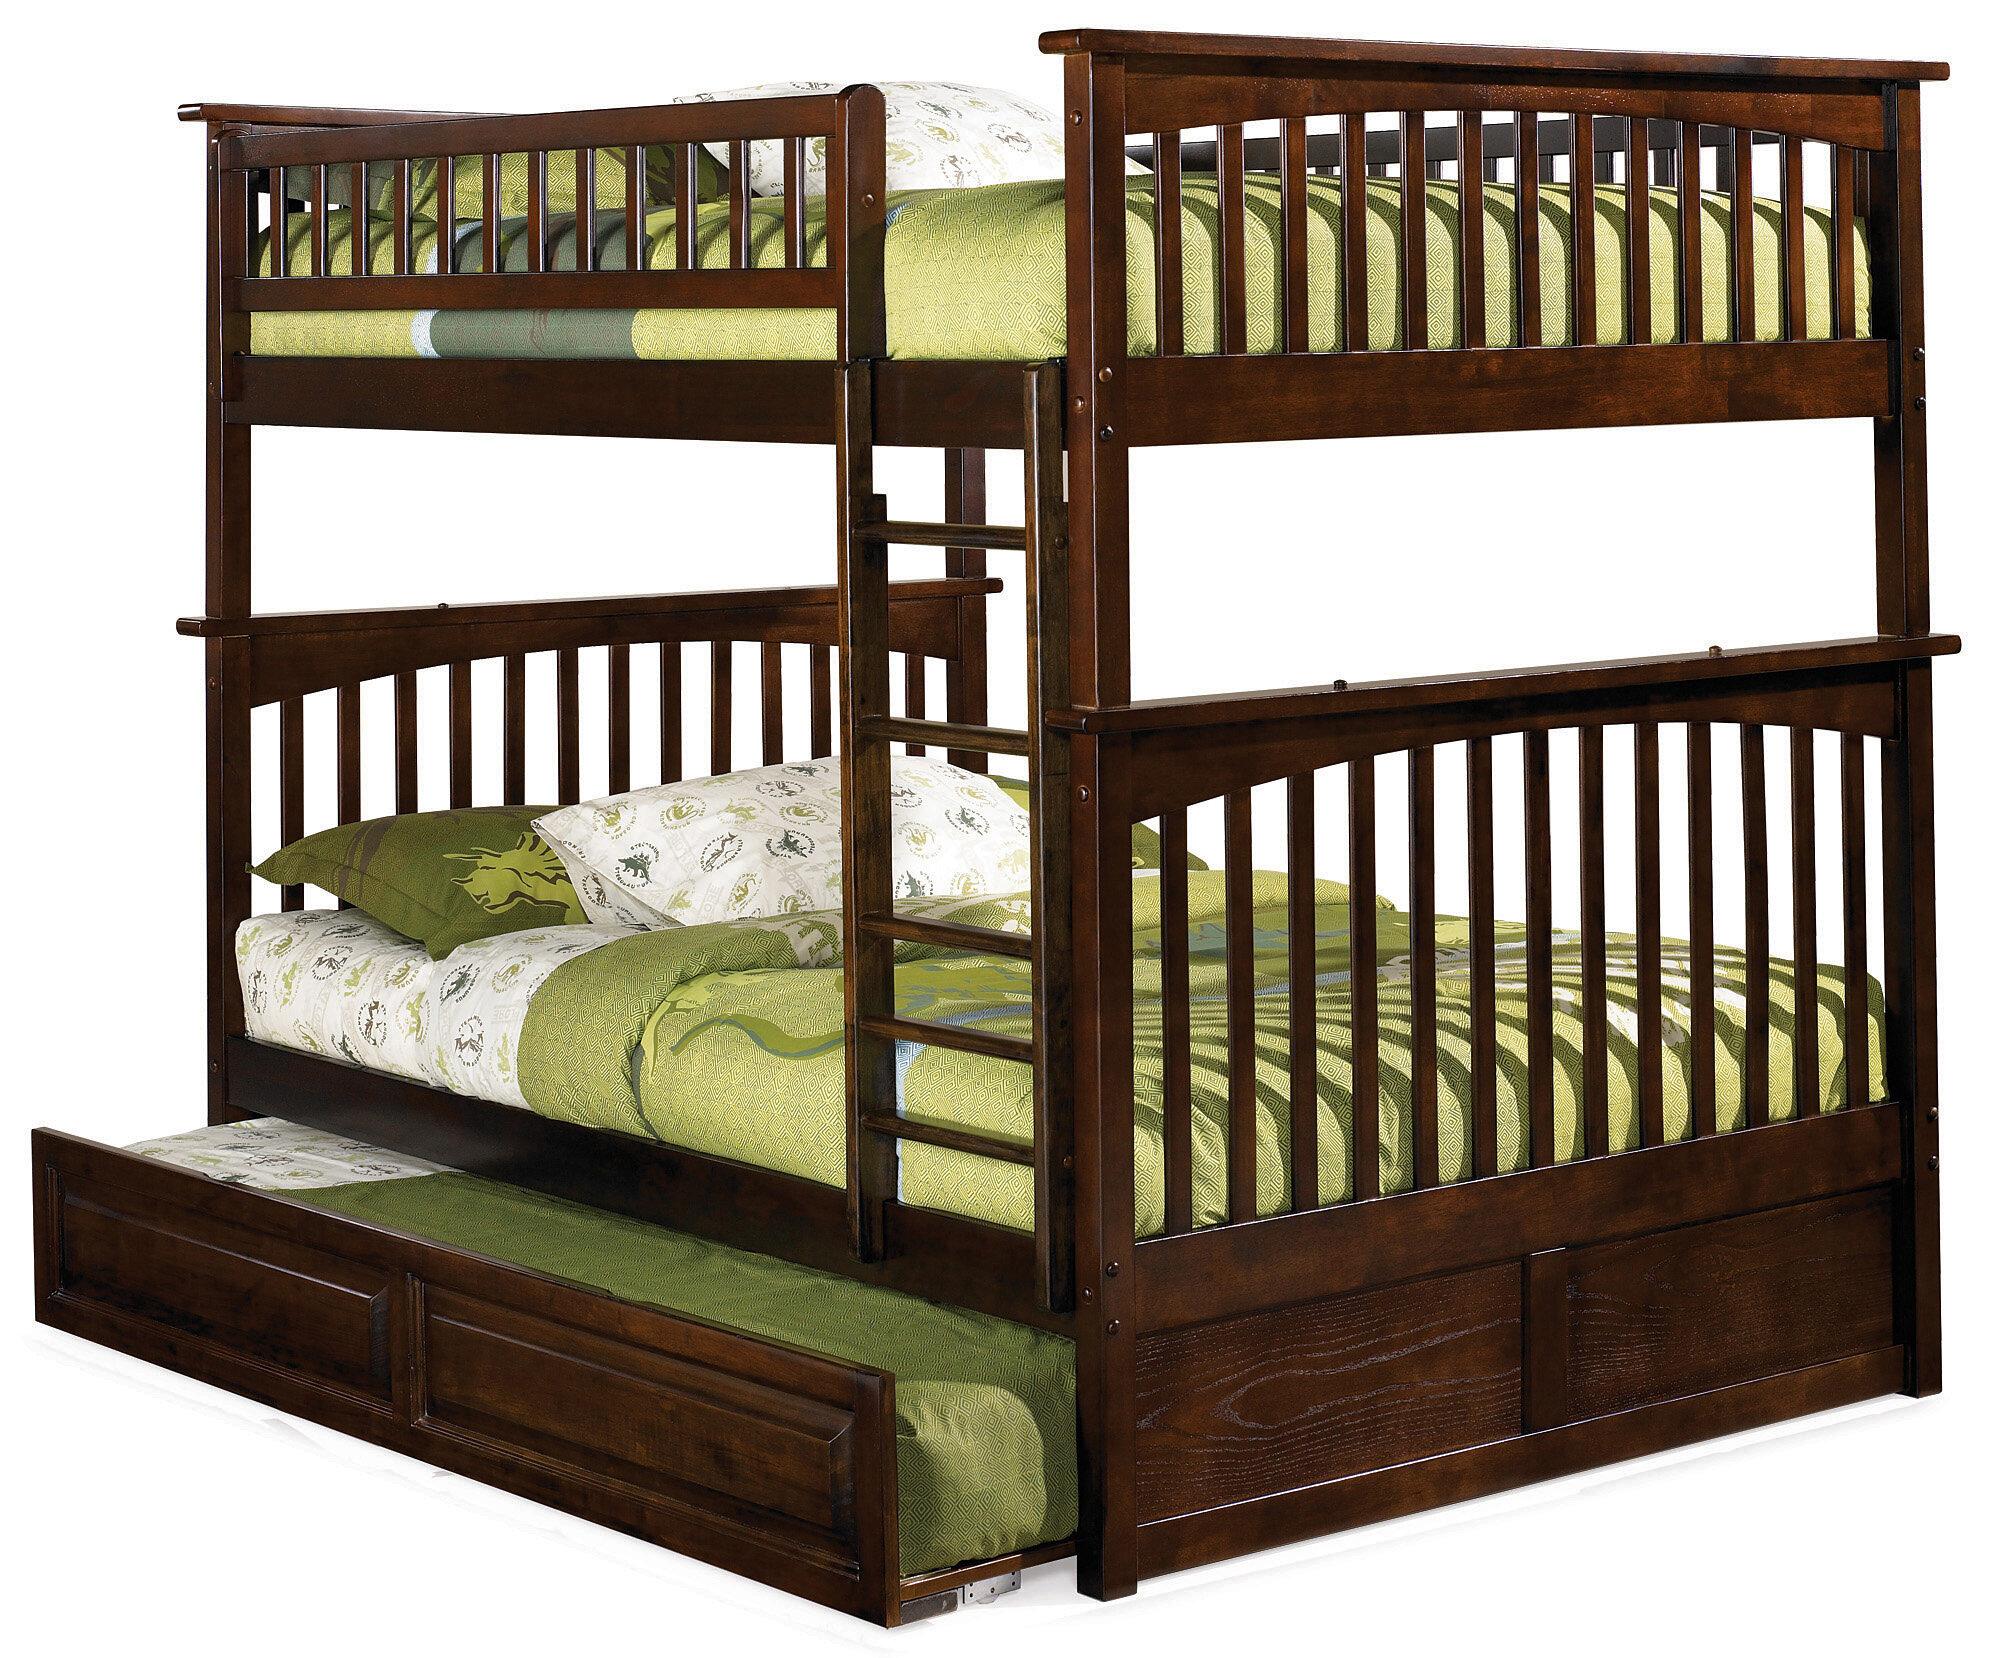 Viv + Rae Henry Bunk Bed with Trundle & Reviews | Wayfair Decorating Small Teen Bedroom Bunk Beds Html on teen bedroom desk, home bunk bed, teen bedroom chairs, office bunk bed, teen bedroom lamp, bedding bunk bed, teen bedroom mirror, teen bedroom loveseat, girls room bunk bed, sleep bunk bed, studio bunk bed, teen boy bedroom, garage bunk bed, furniture bunk bed, teen bedroom vanity, teen bedroom bathroom, closet bunk bed, family bunk bed, lamps bunk bed, teen bedroom loft,